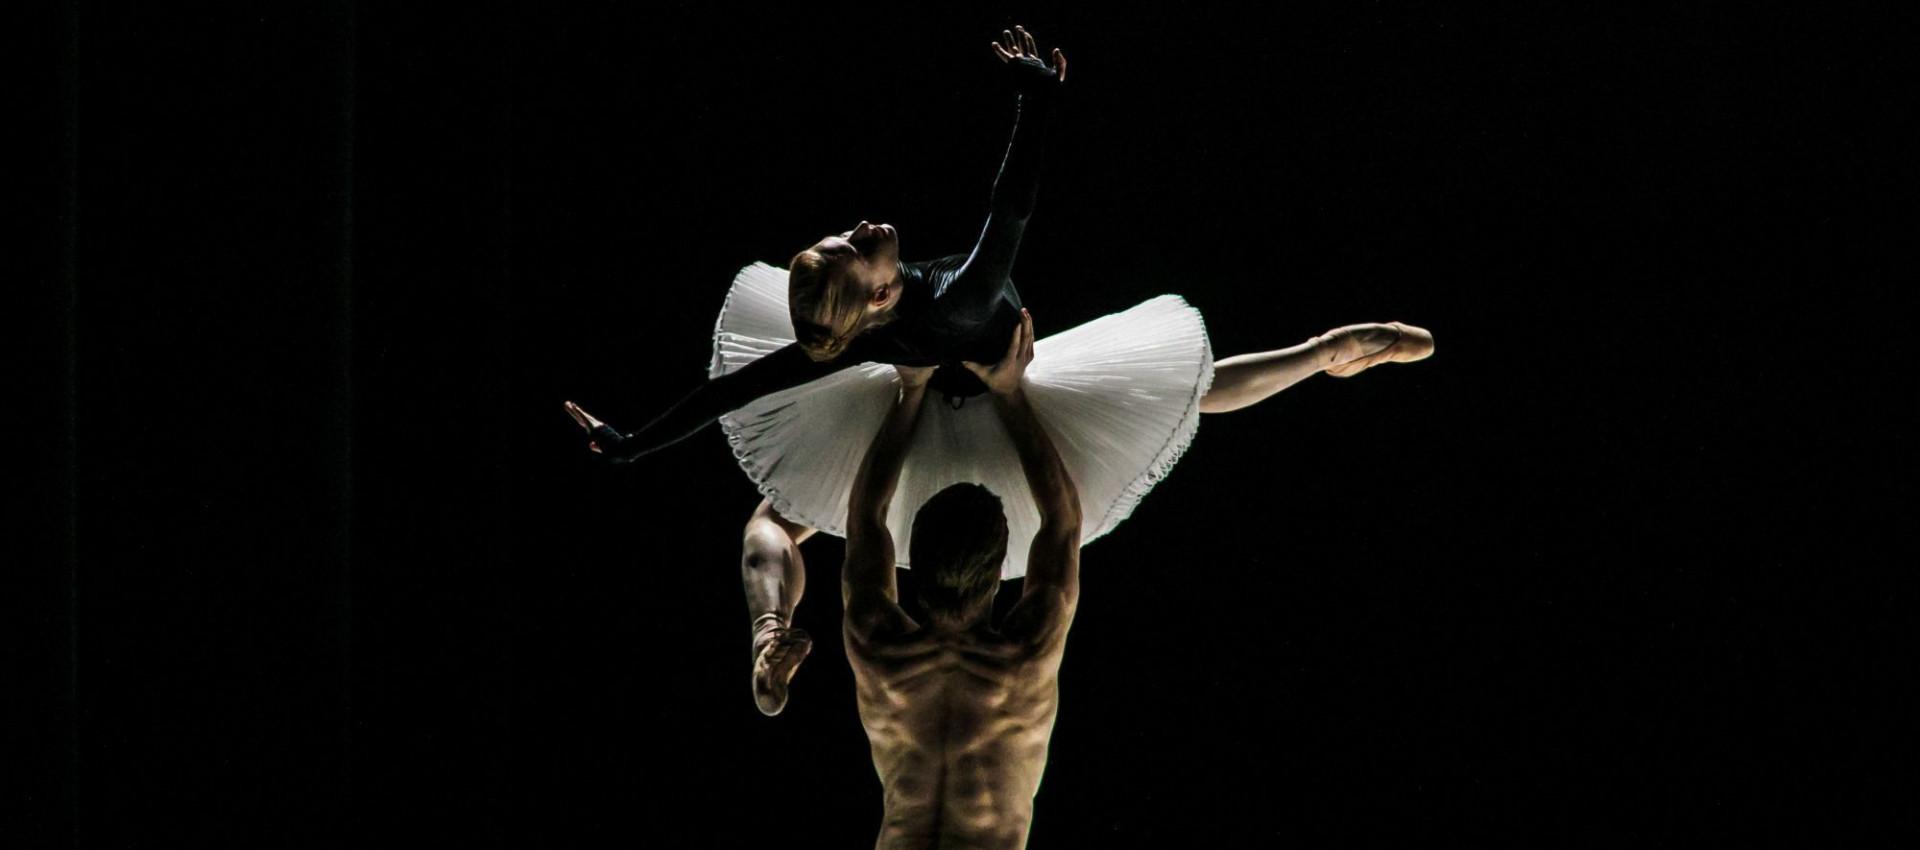 Ballet Company of Győr: Movements to Stravinsky / Mimi - première